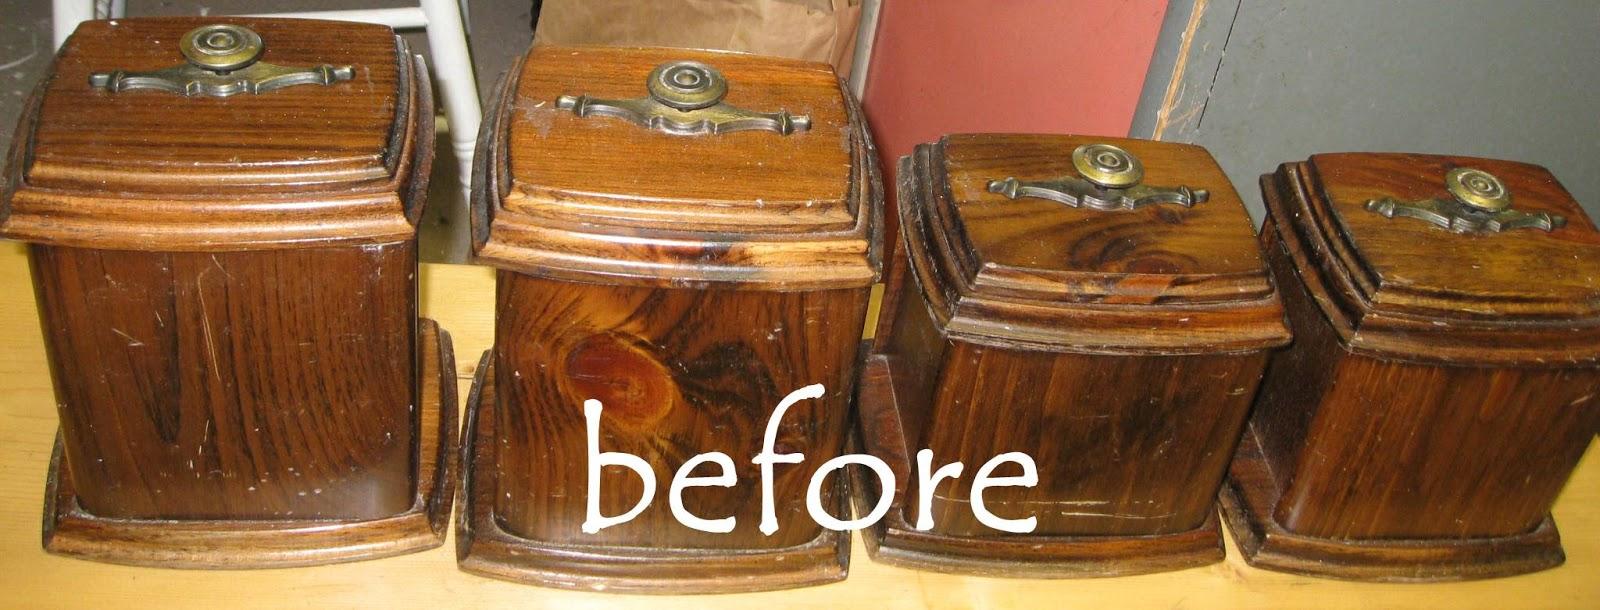 kammy s korner vintage revival shabby canister set vintage revival shabby canister set